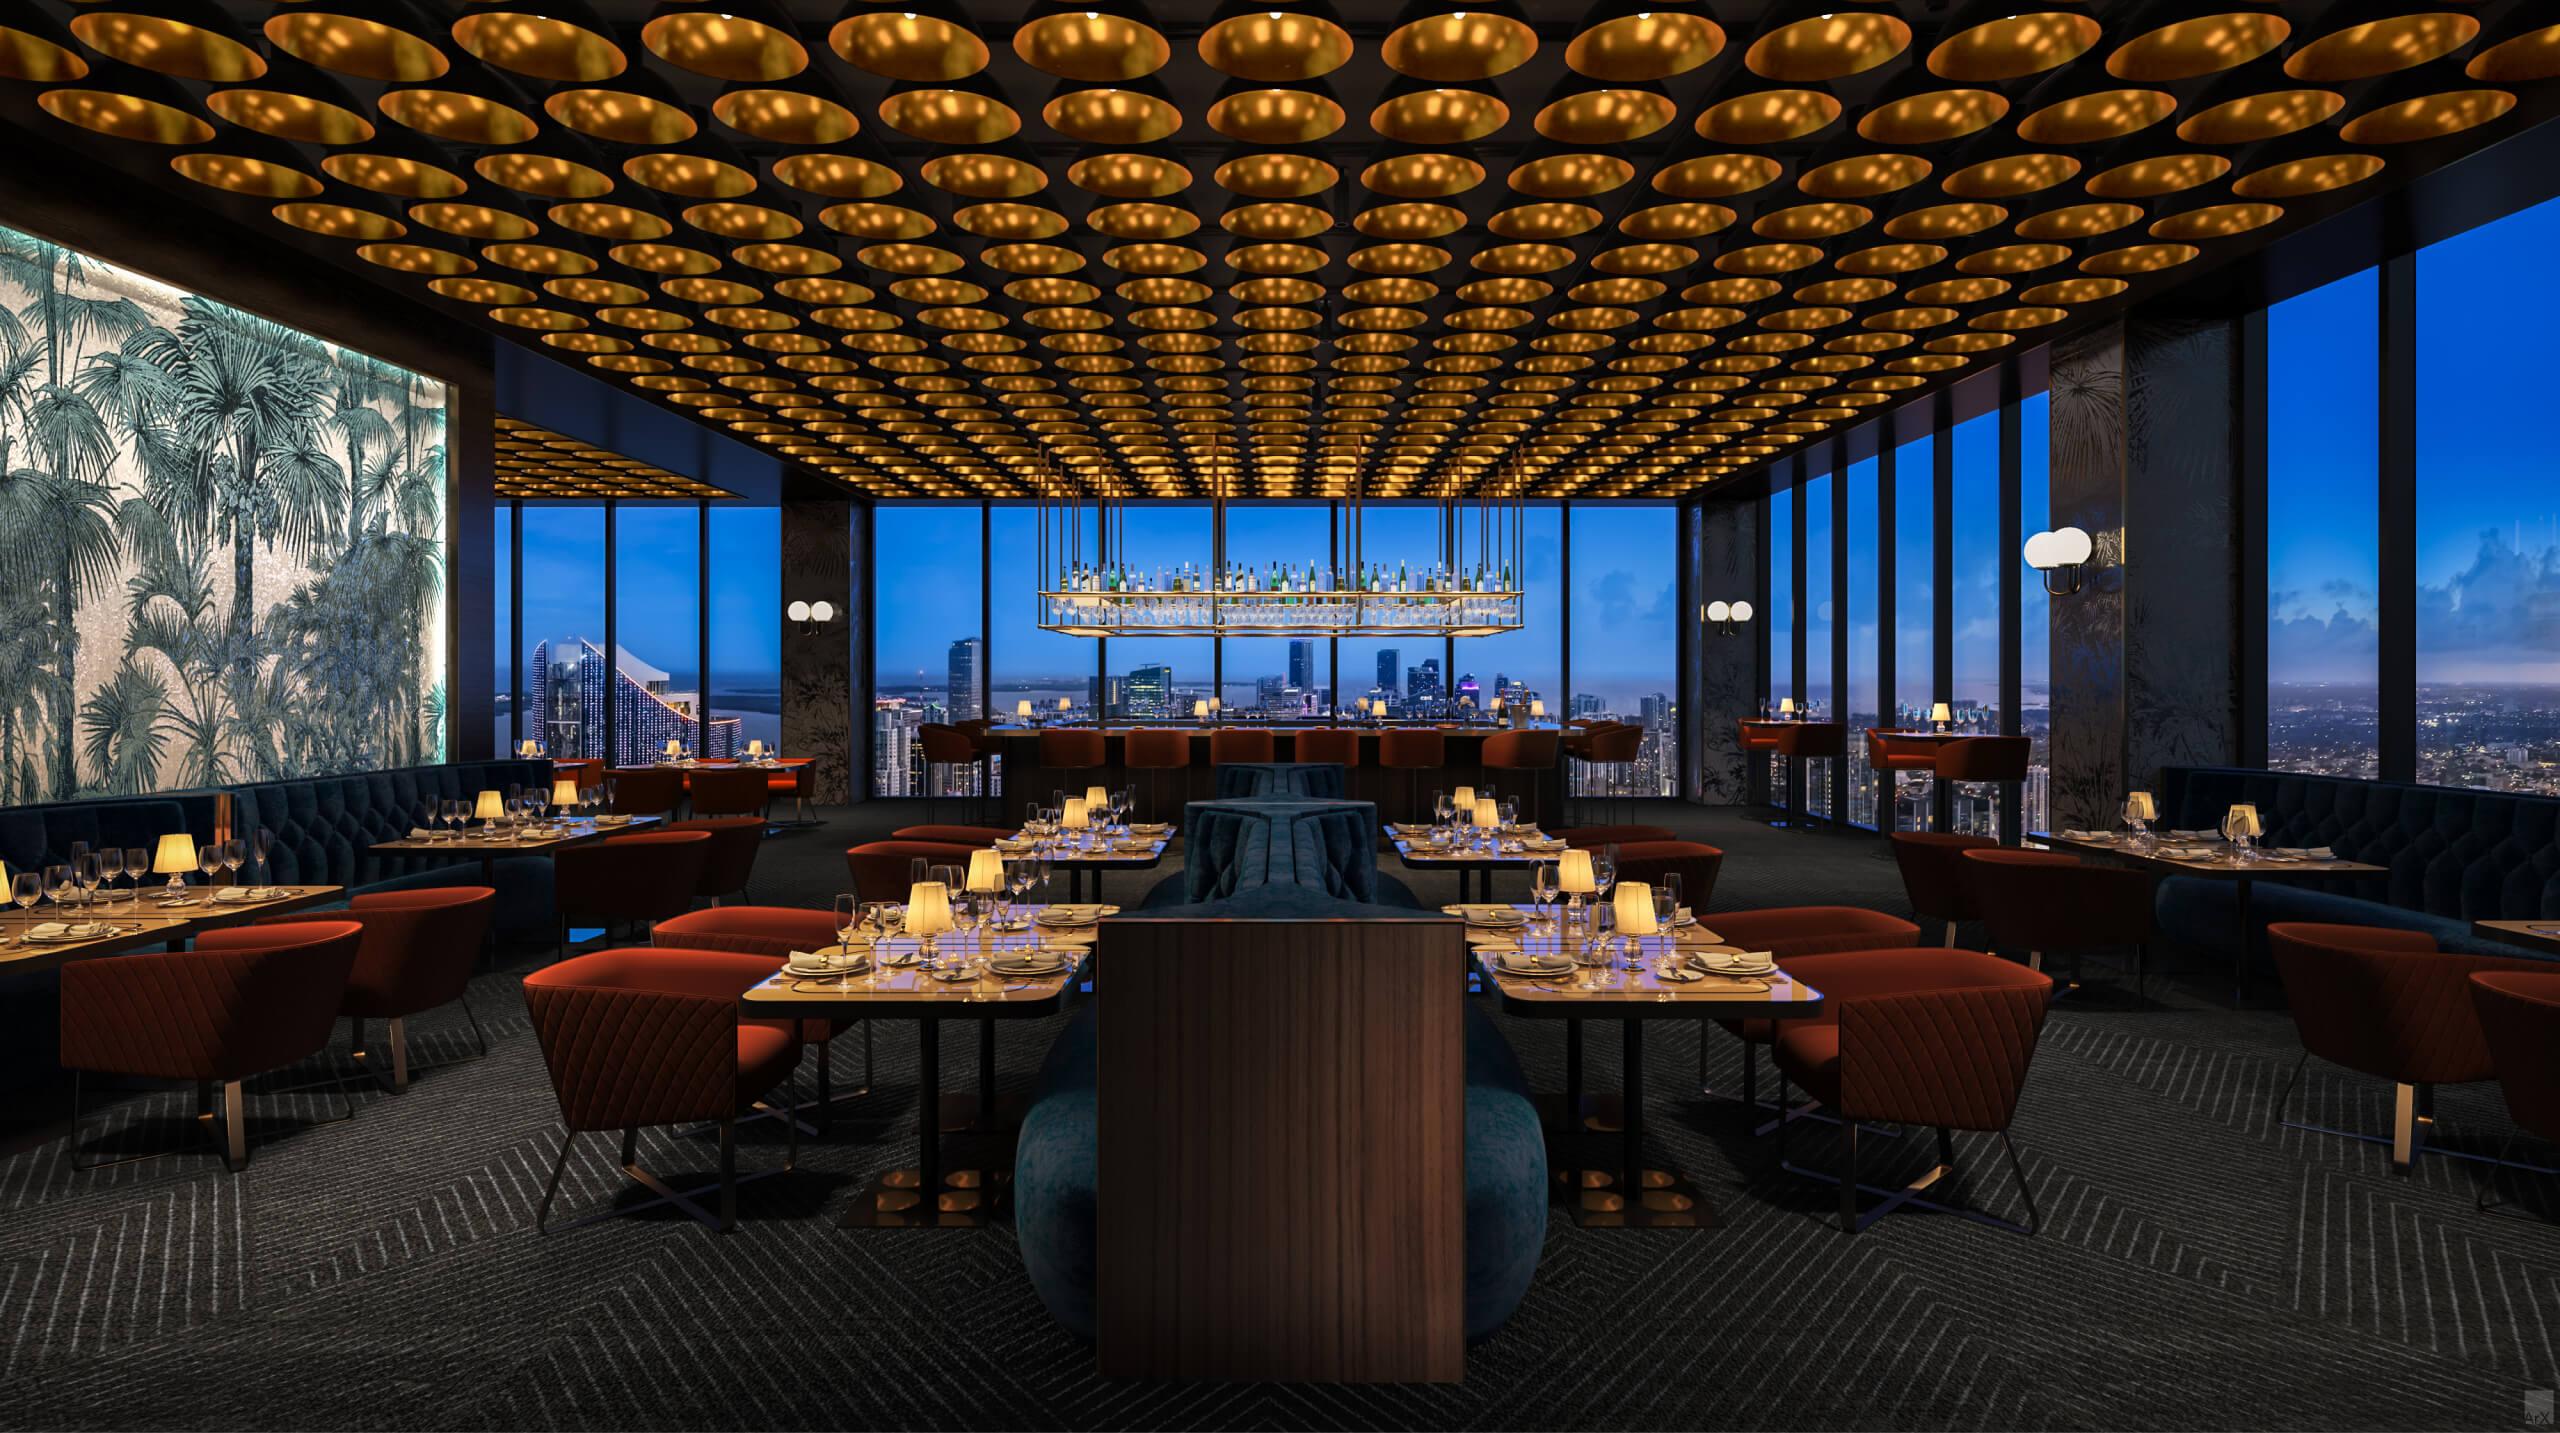 Restaurant. Designed by AvroKO Hospitality Group & Studio Ramirez.